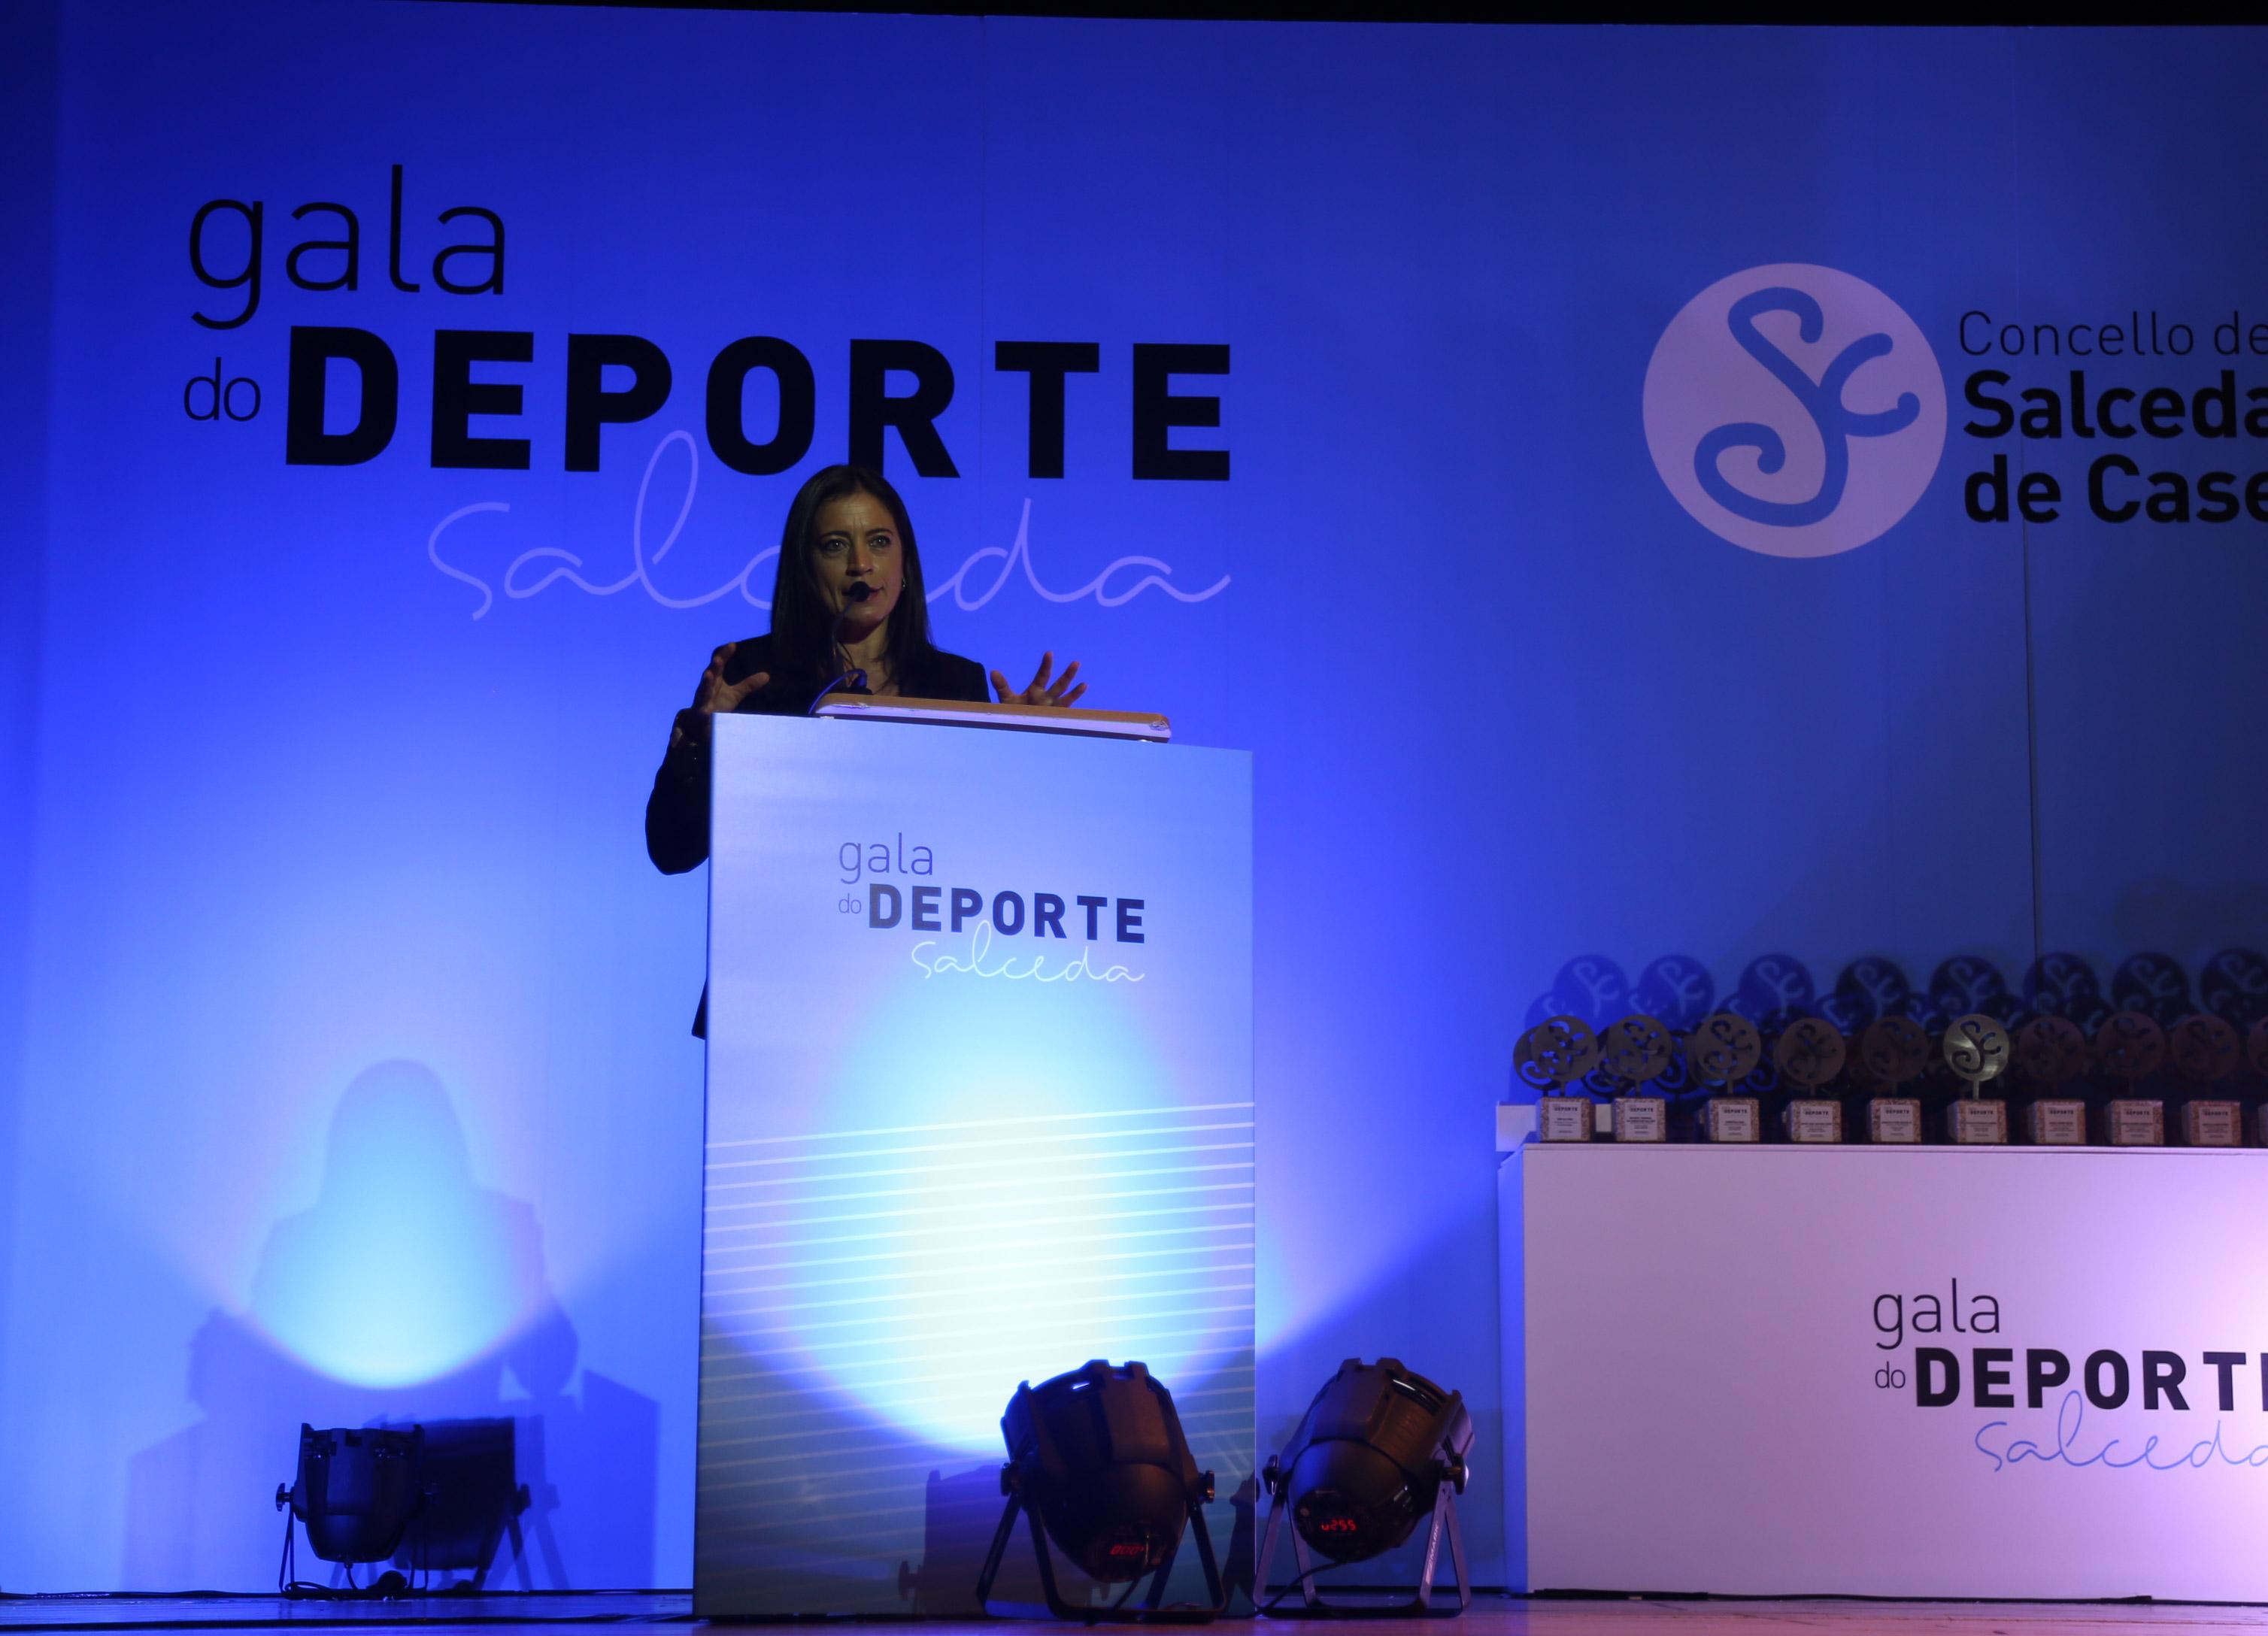 Ana Pérez TVG presentadora evento I Gala do Deporte del Concello de Salceda